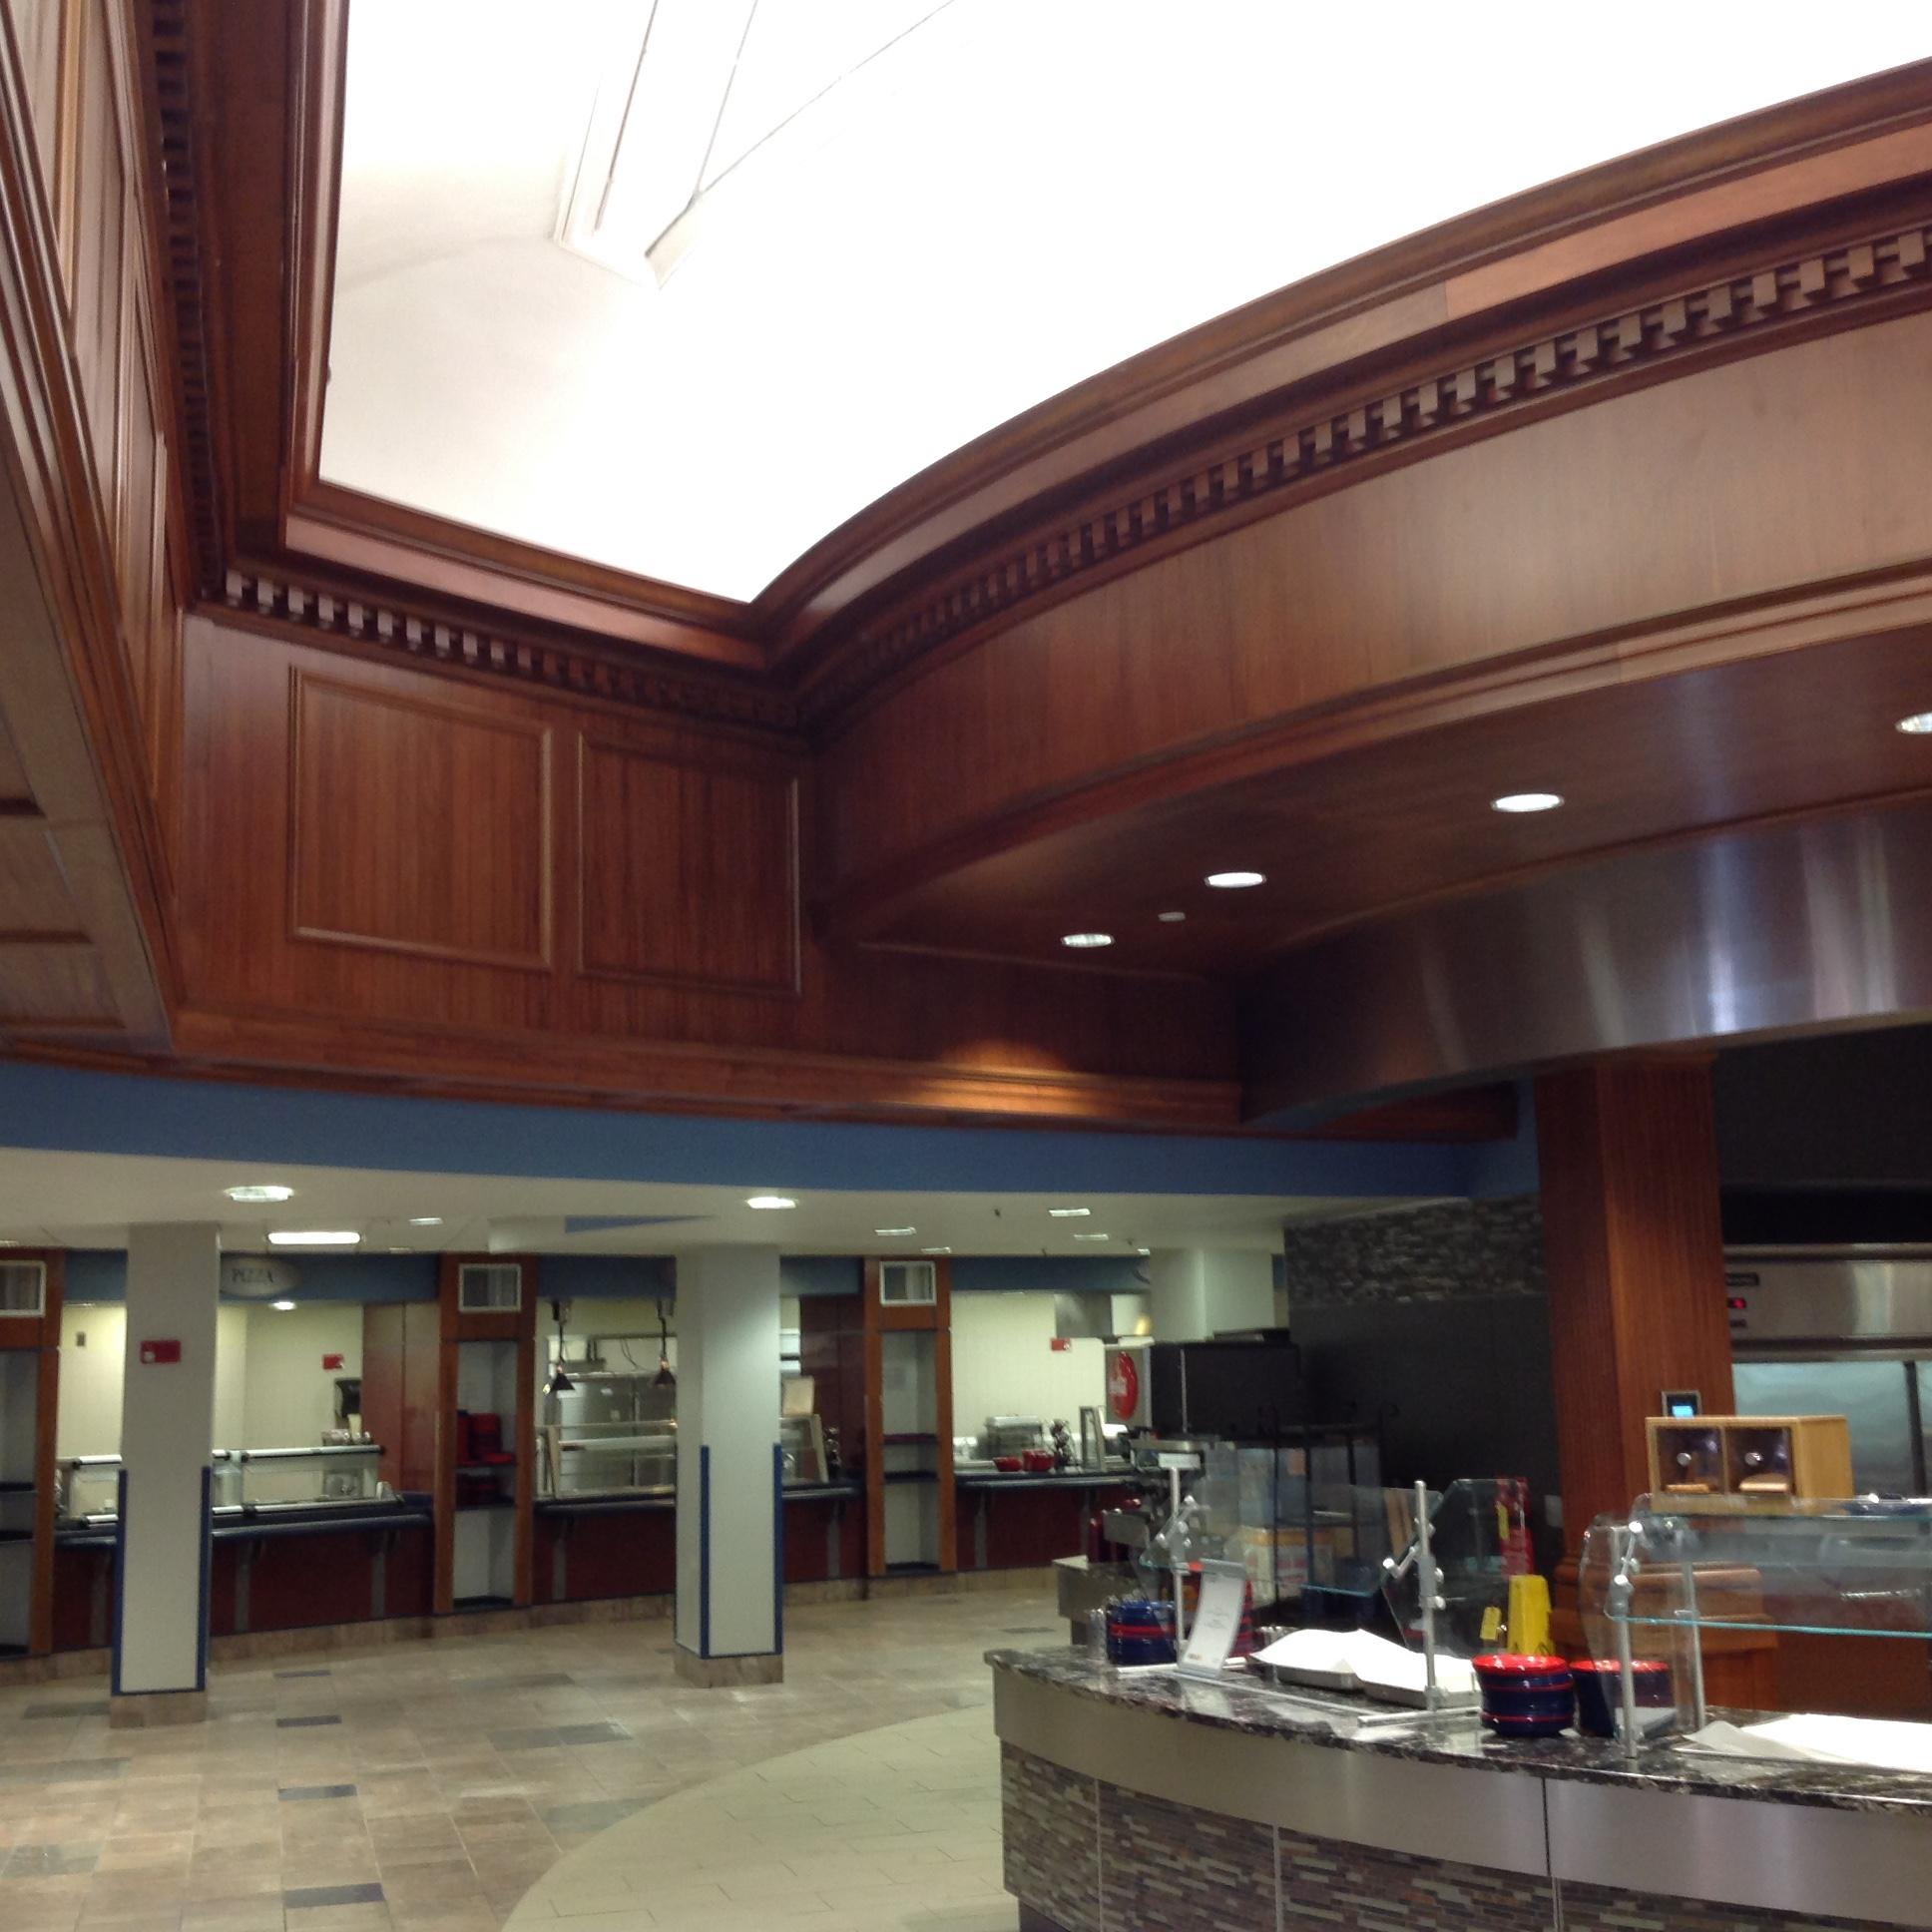 Samford Dining Hall